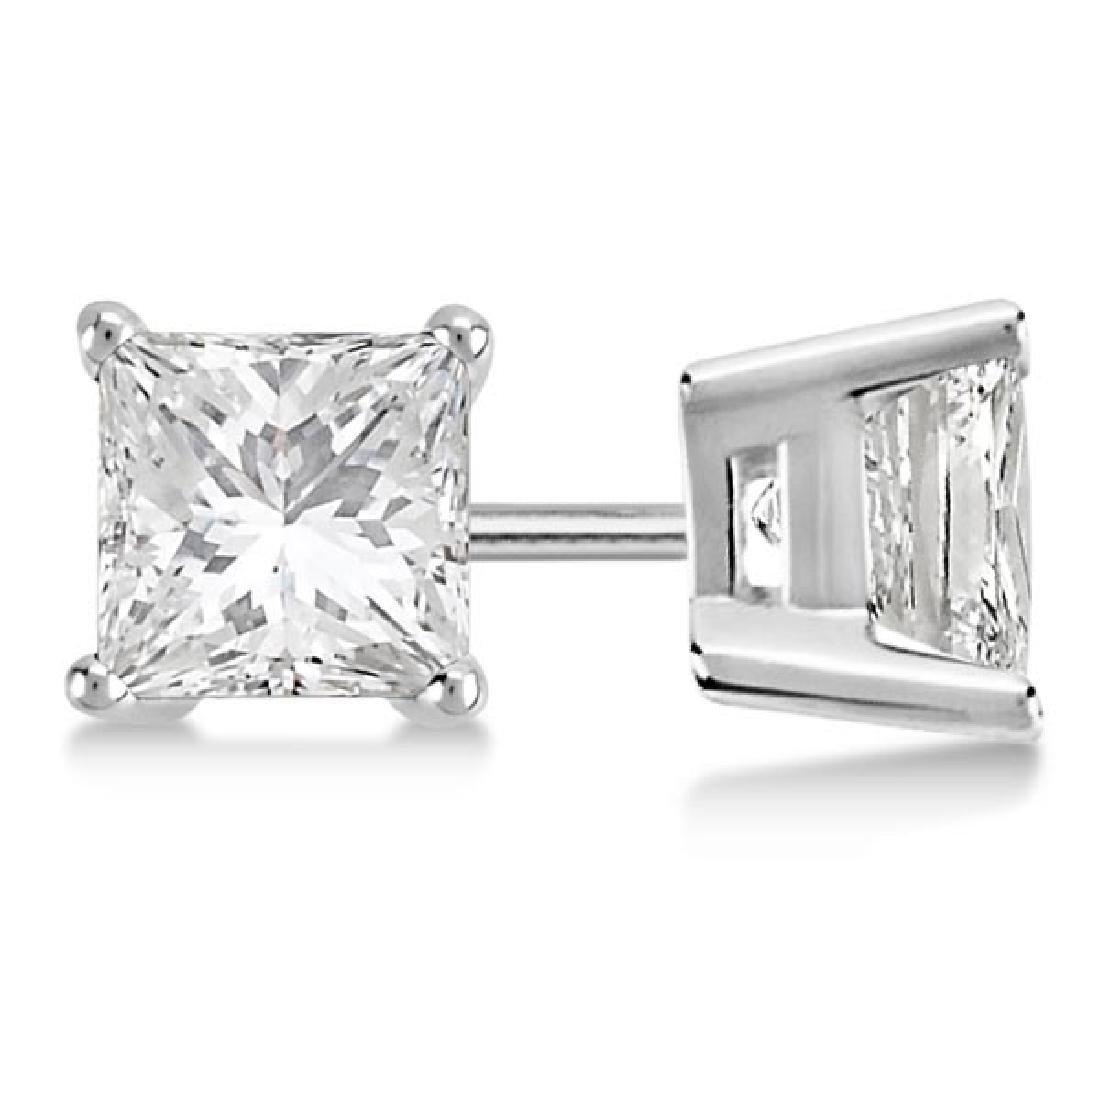 Certified 1.31 CTW Princess Diamond Stud Earrings G/SI3